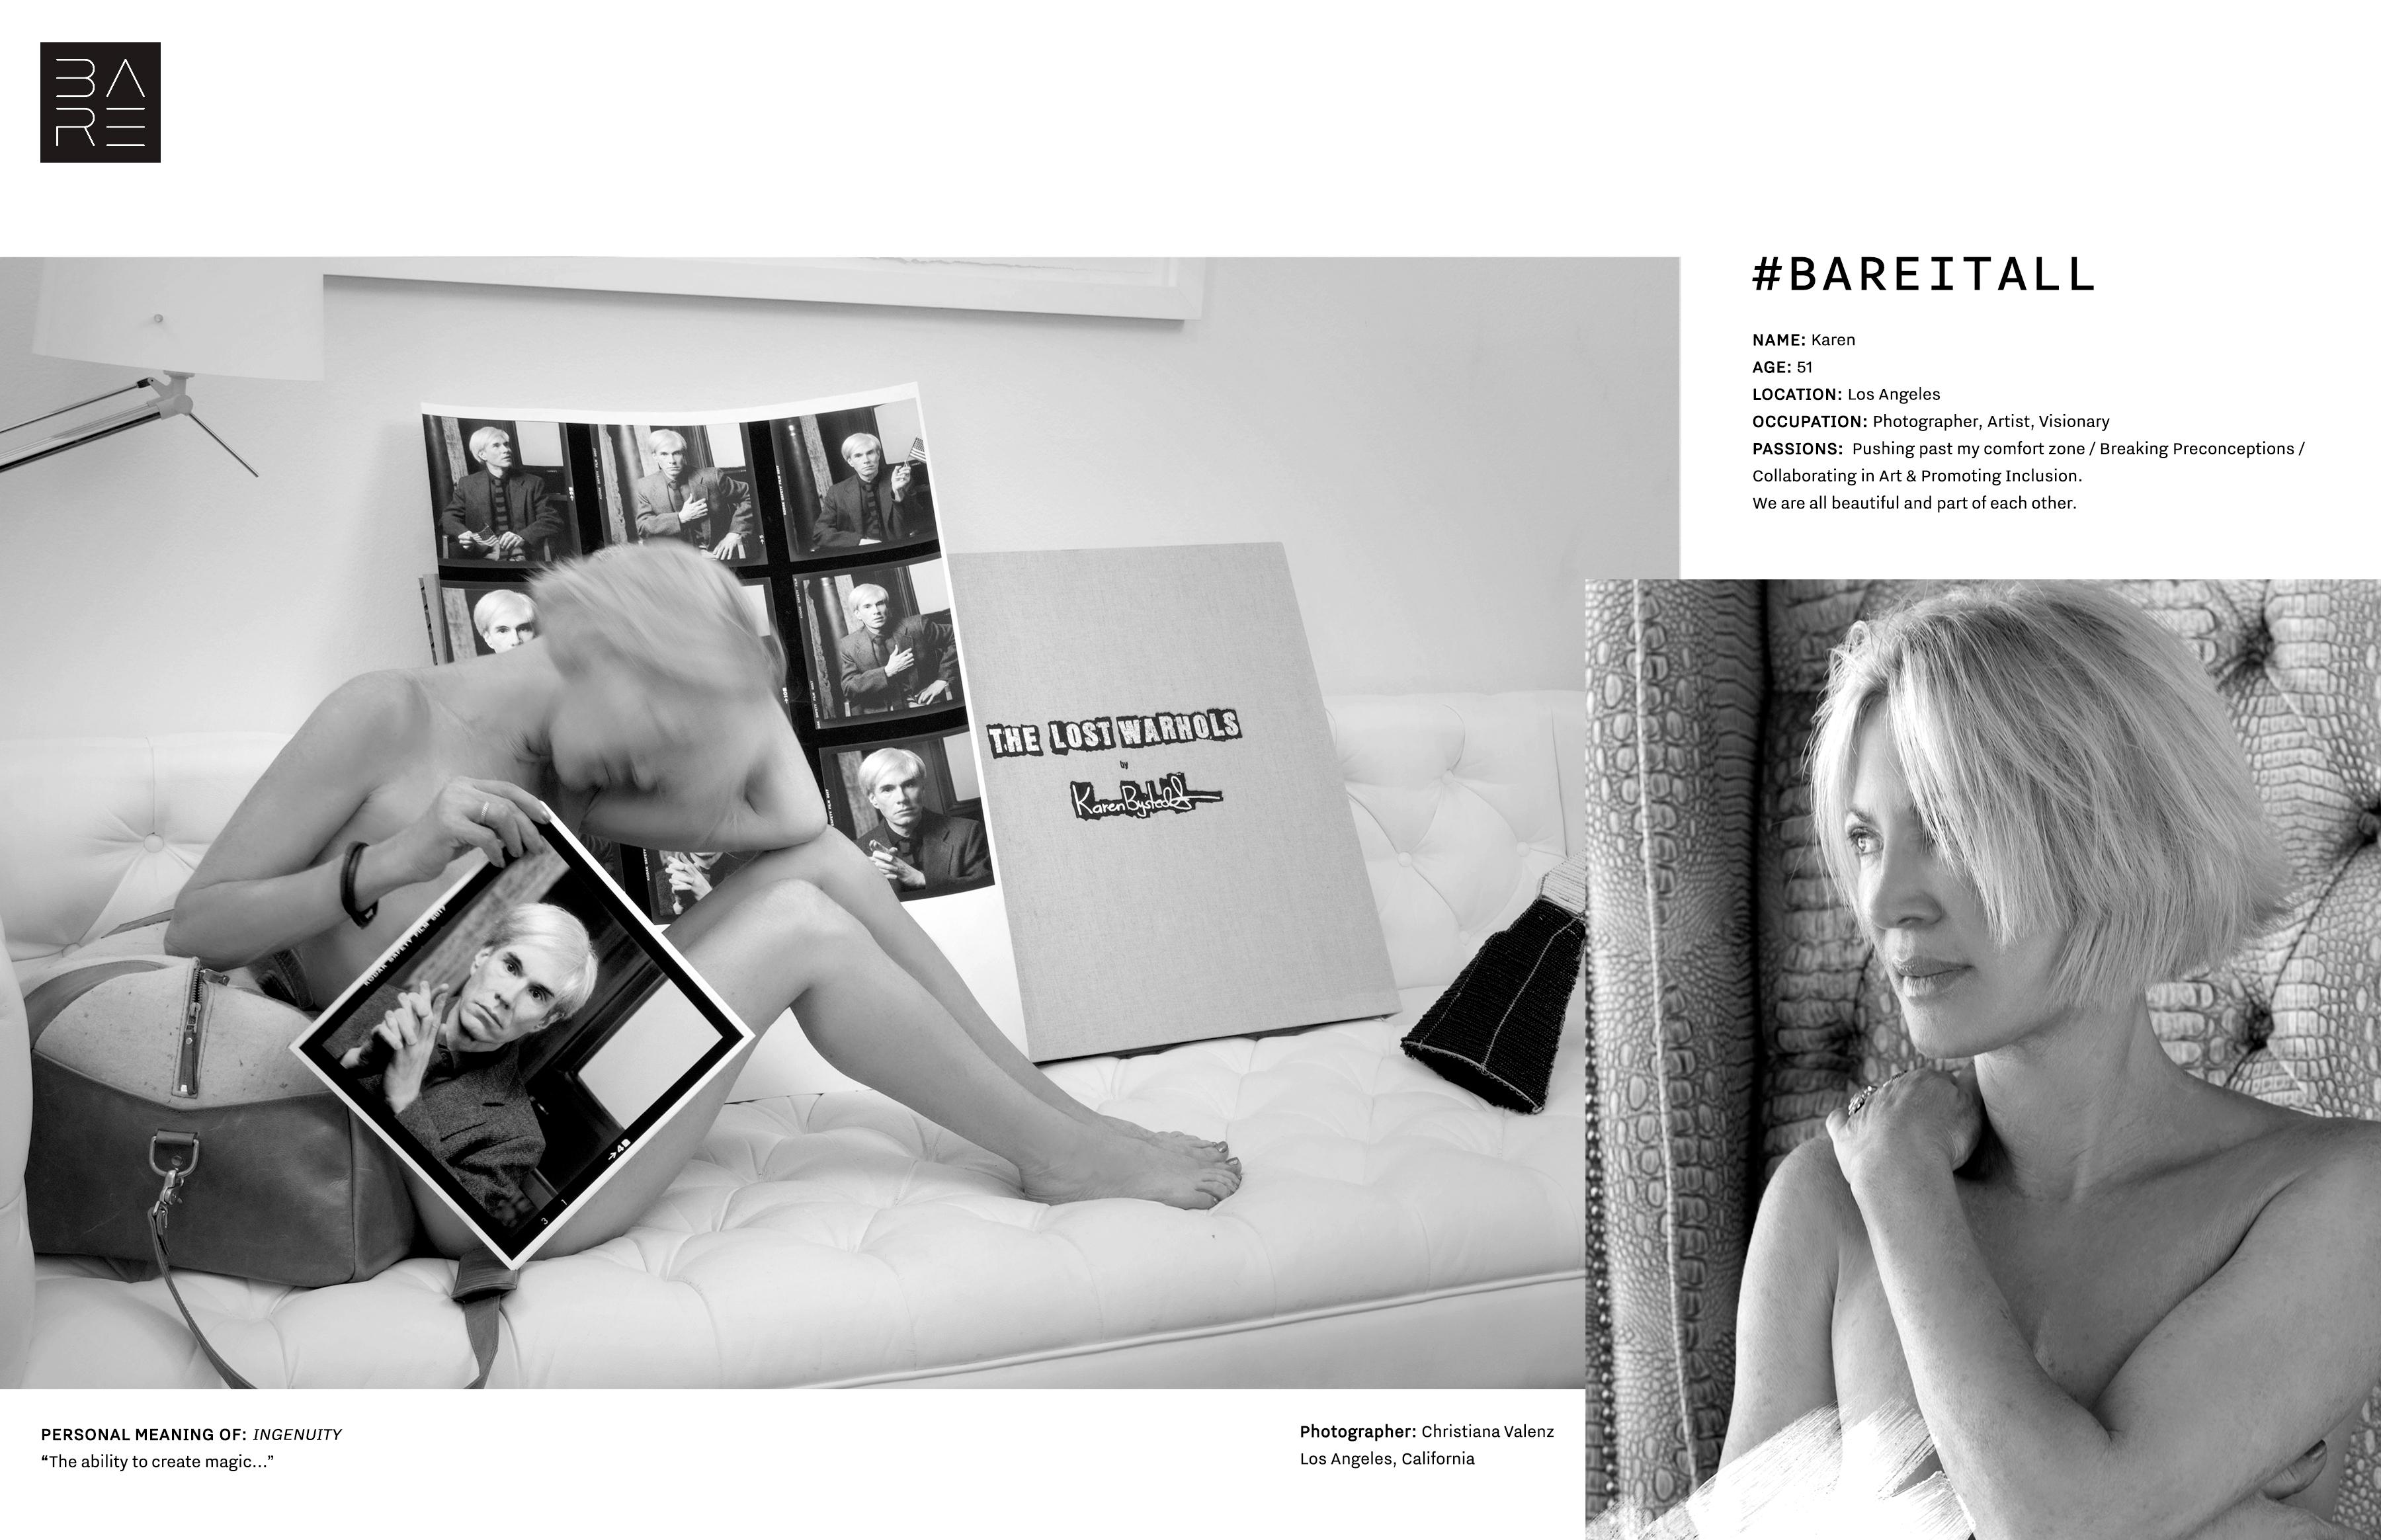 Karen Bystedt (Artist, Photographer)